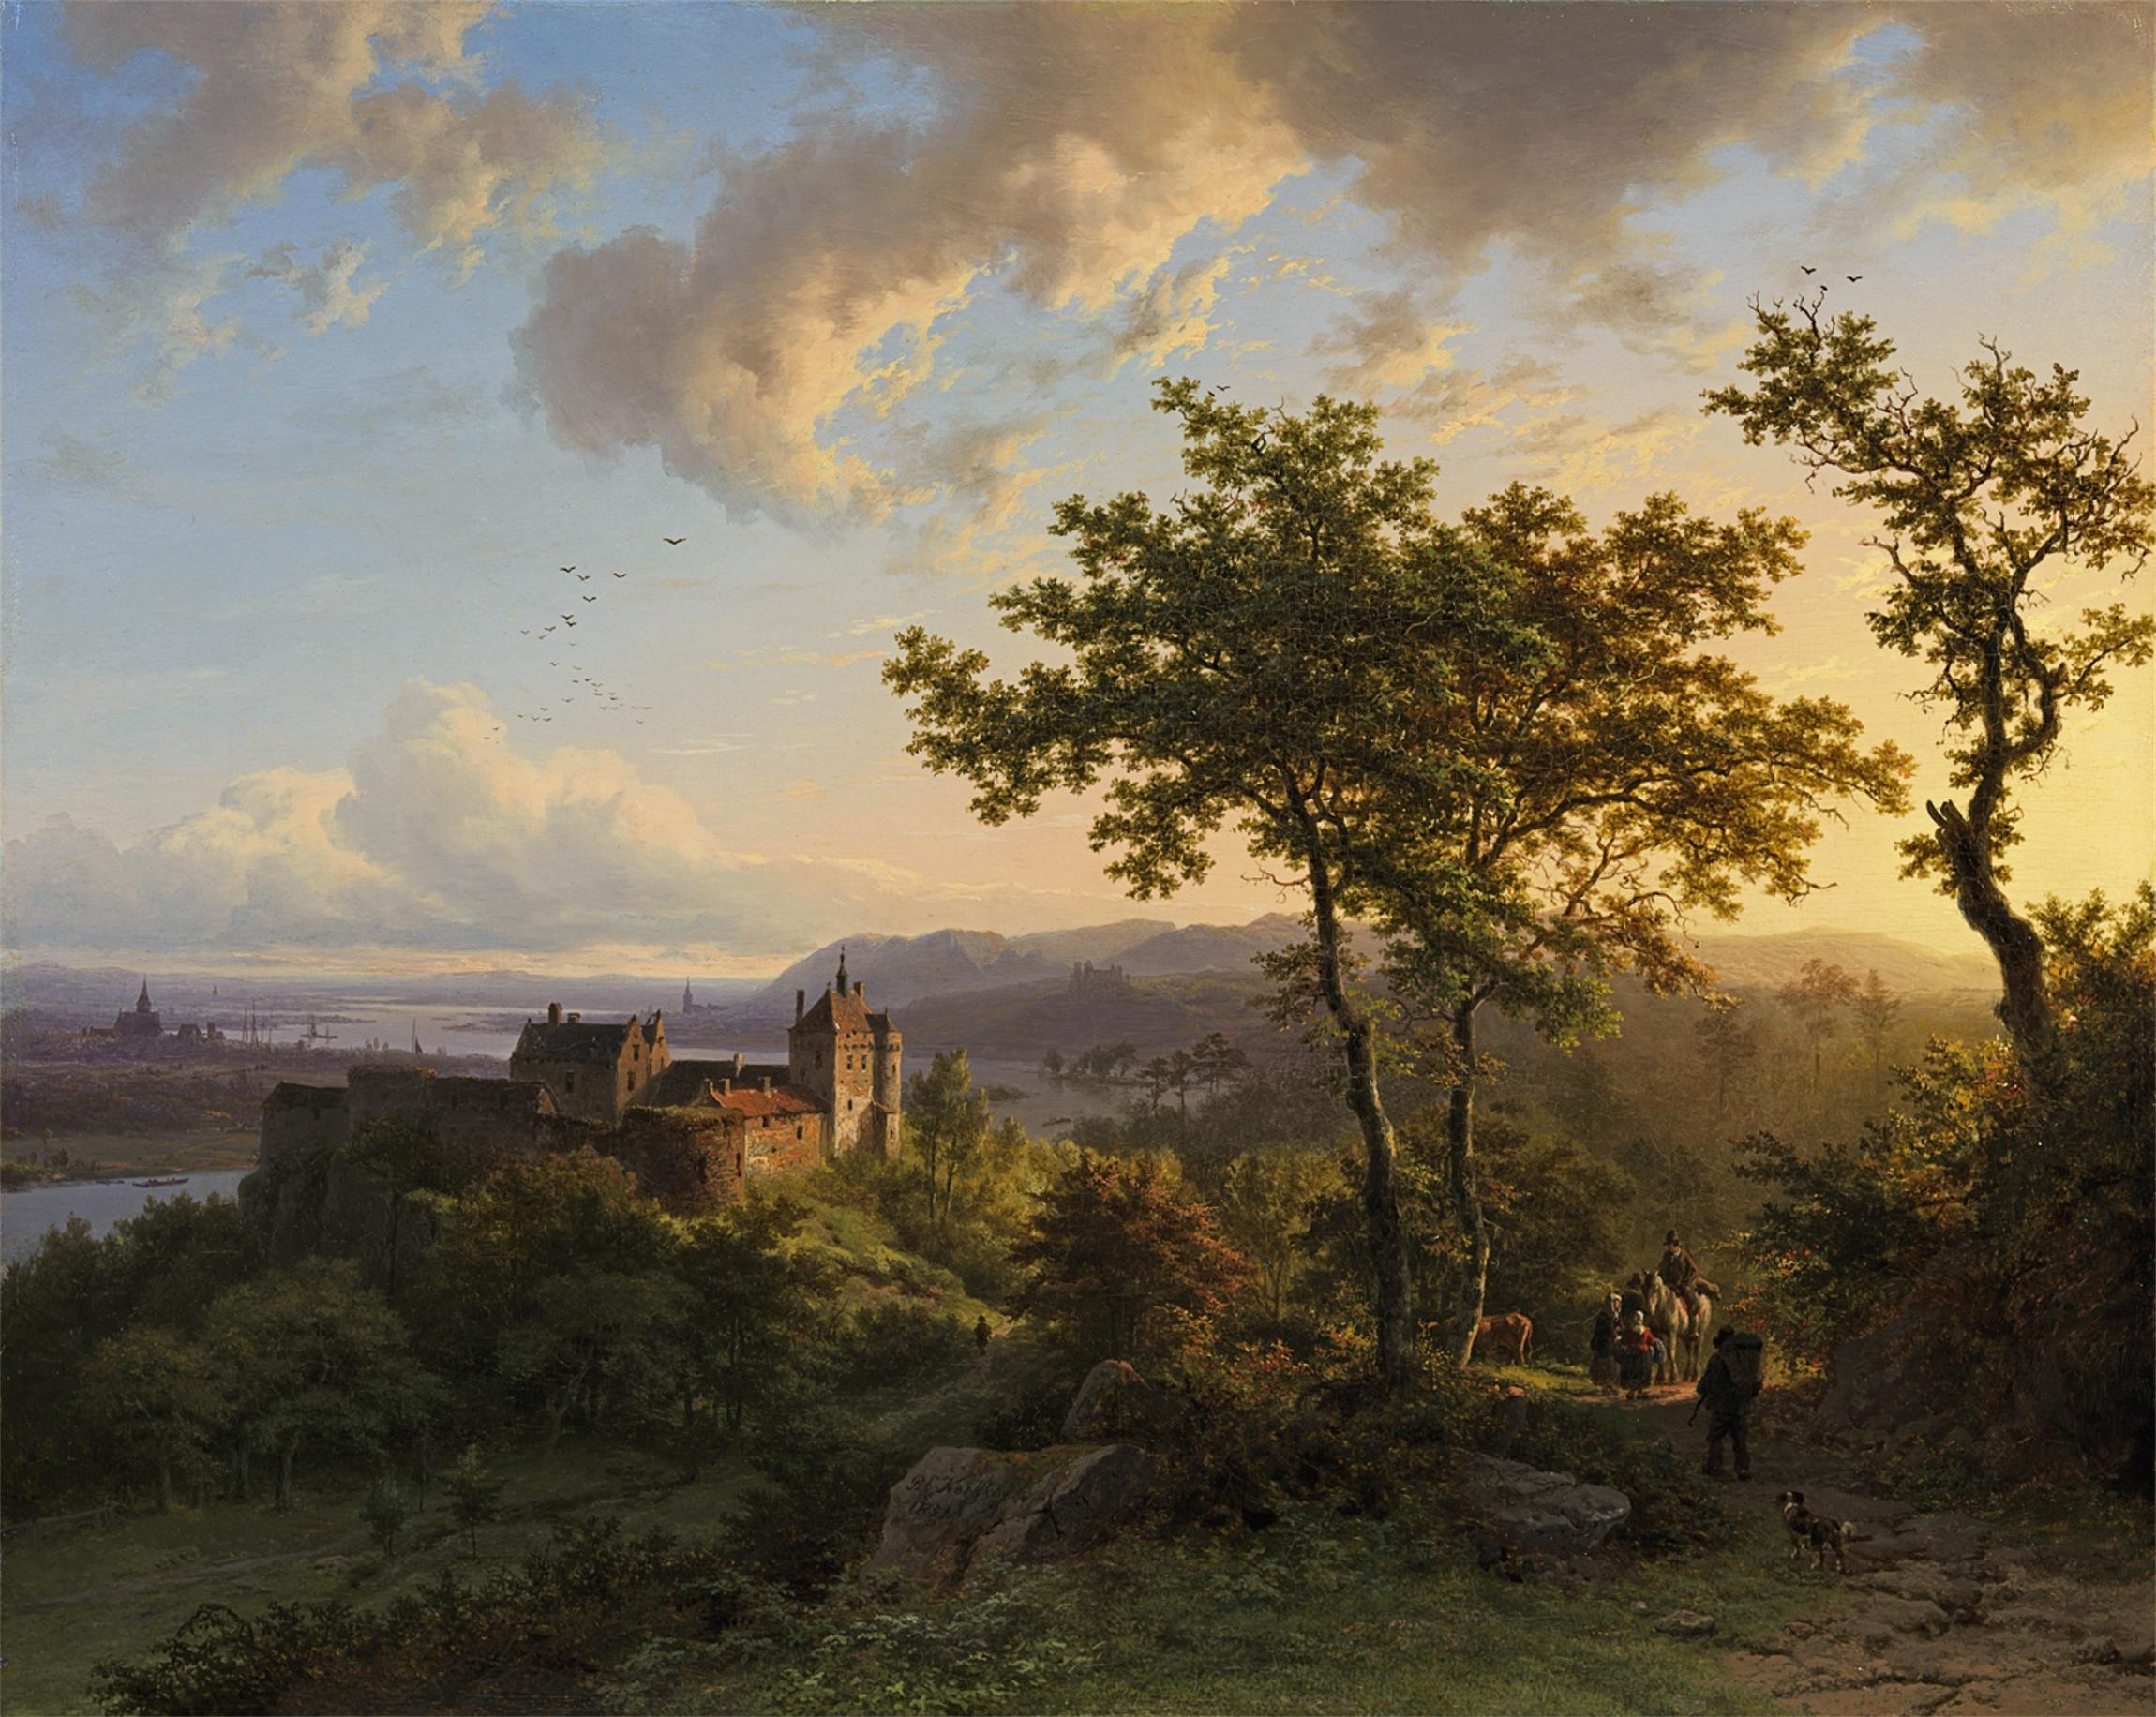 Barend Cornelis Koekkoek, Sommerliche Waldlandschaft mit Burg, 1851